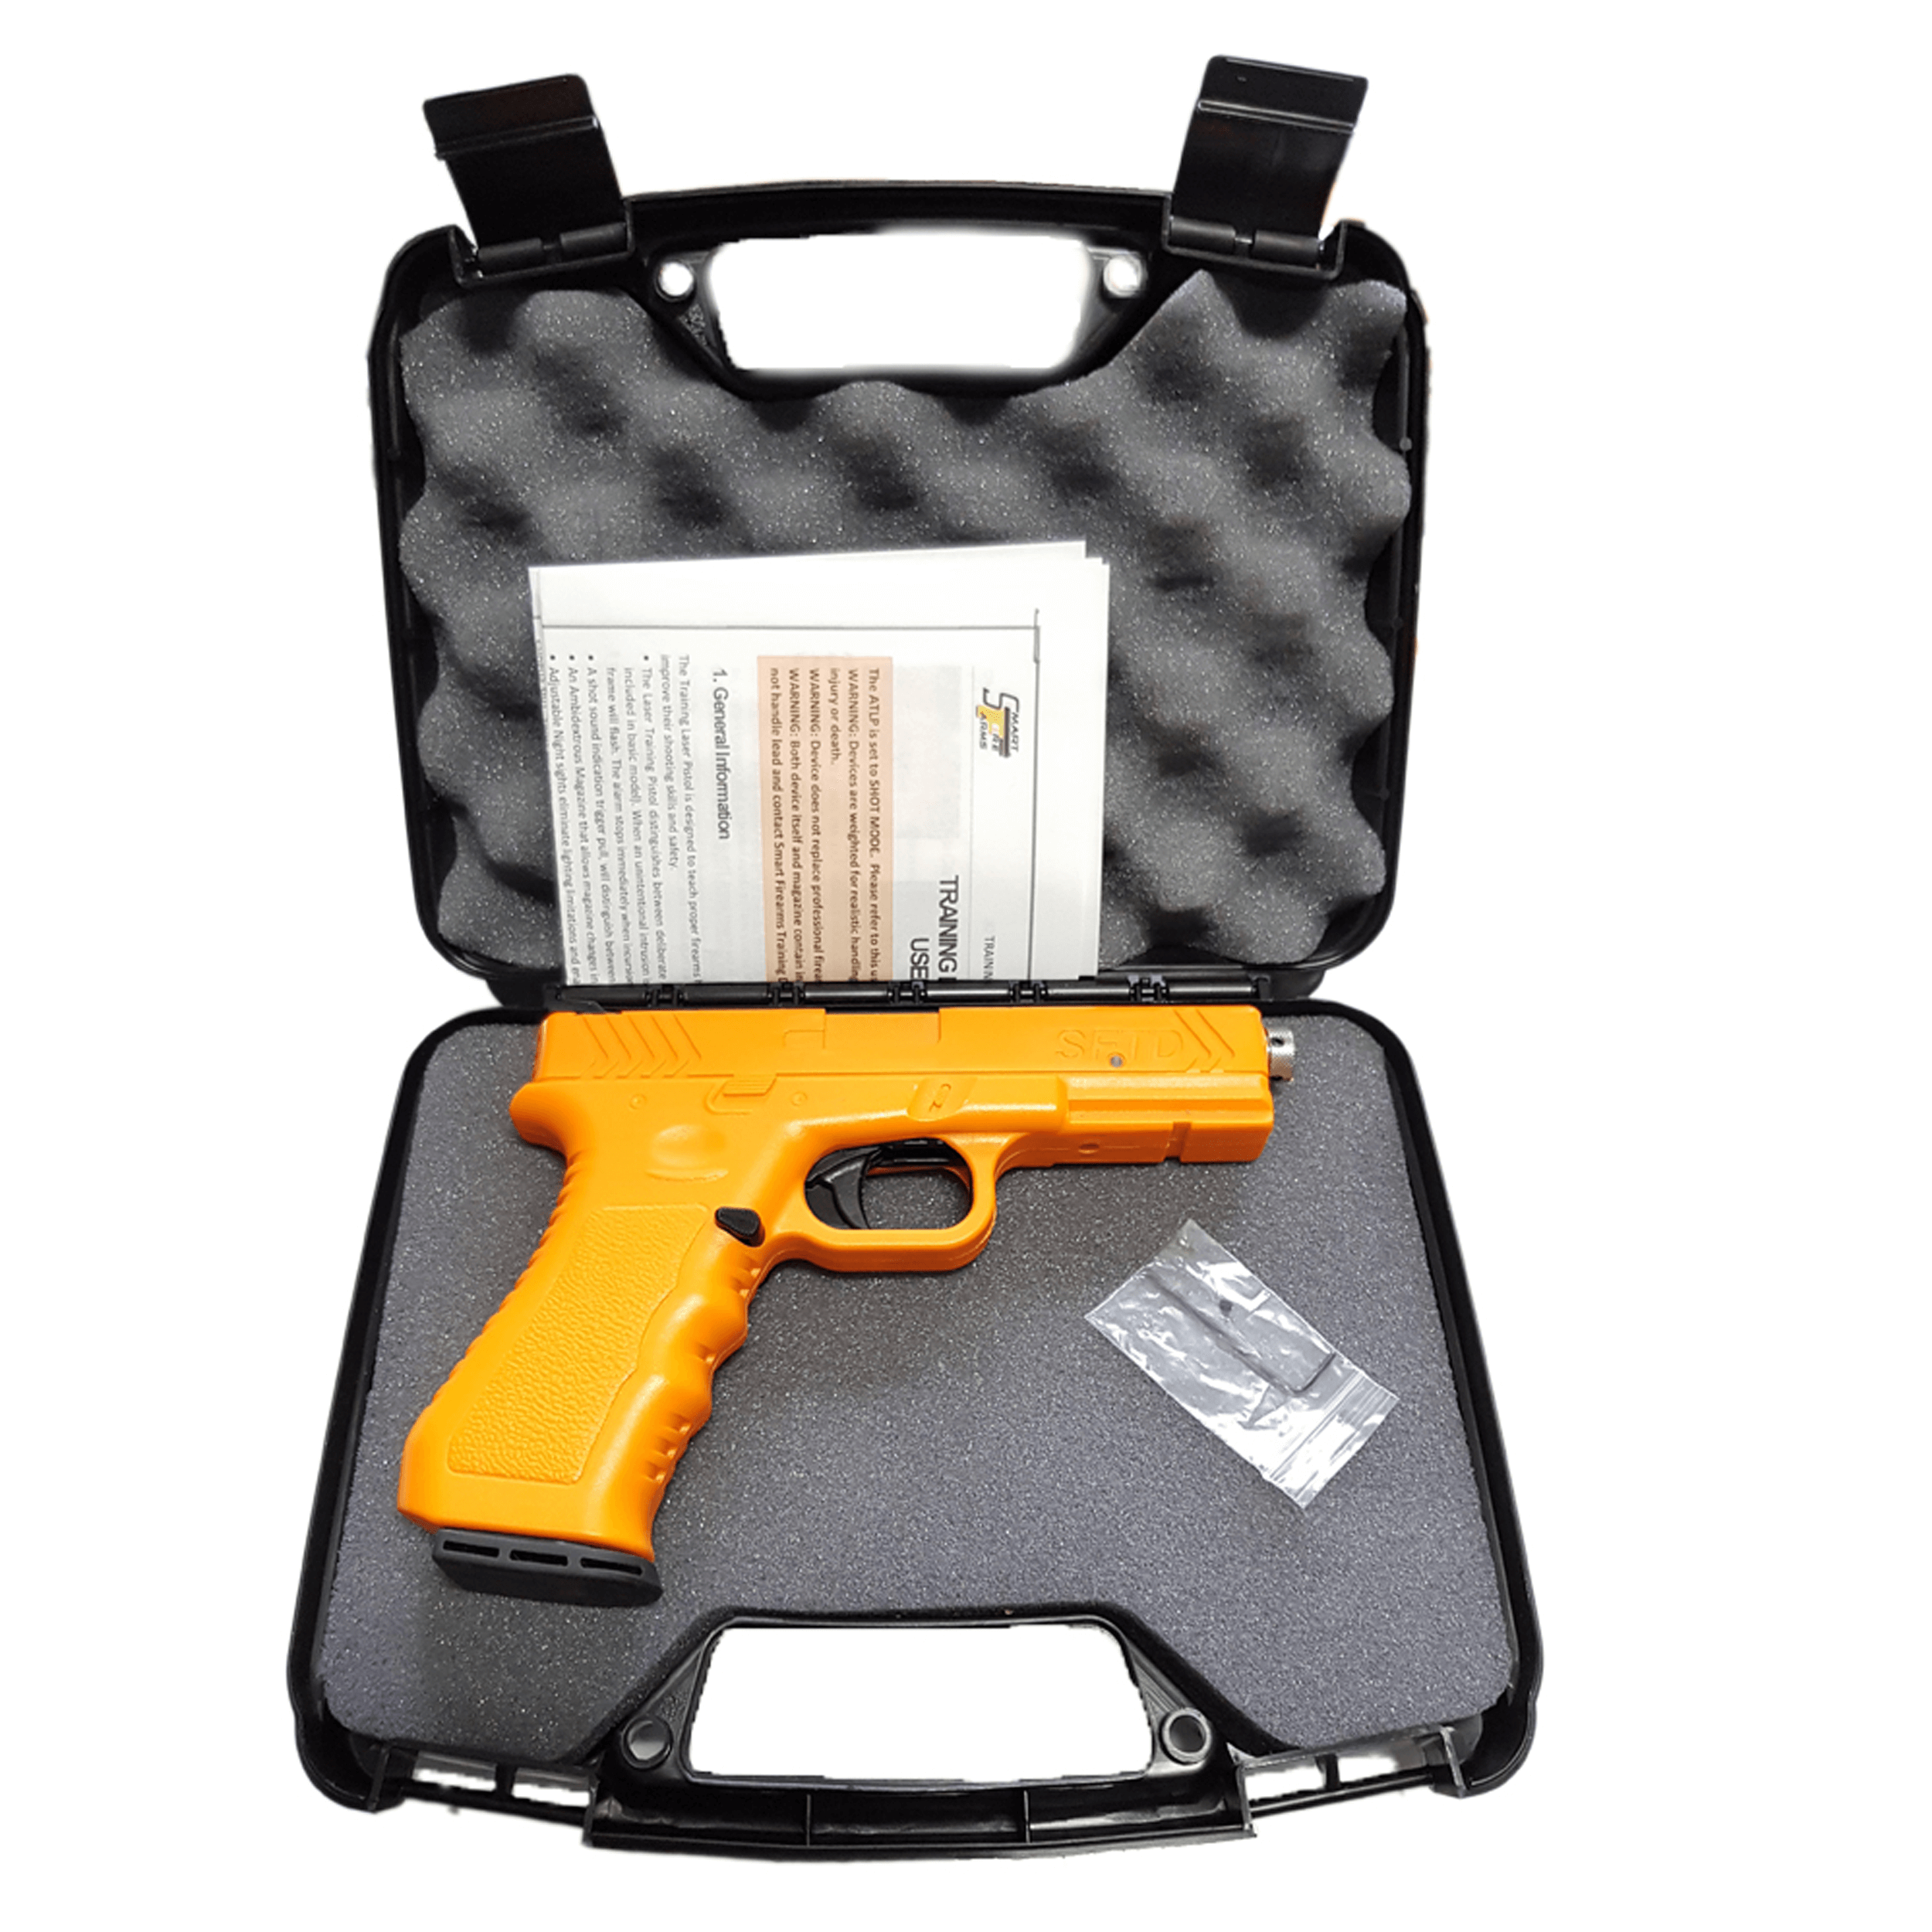 Glock 17 kompatible Pro Laser Training Pistol